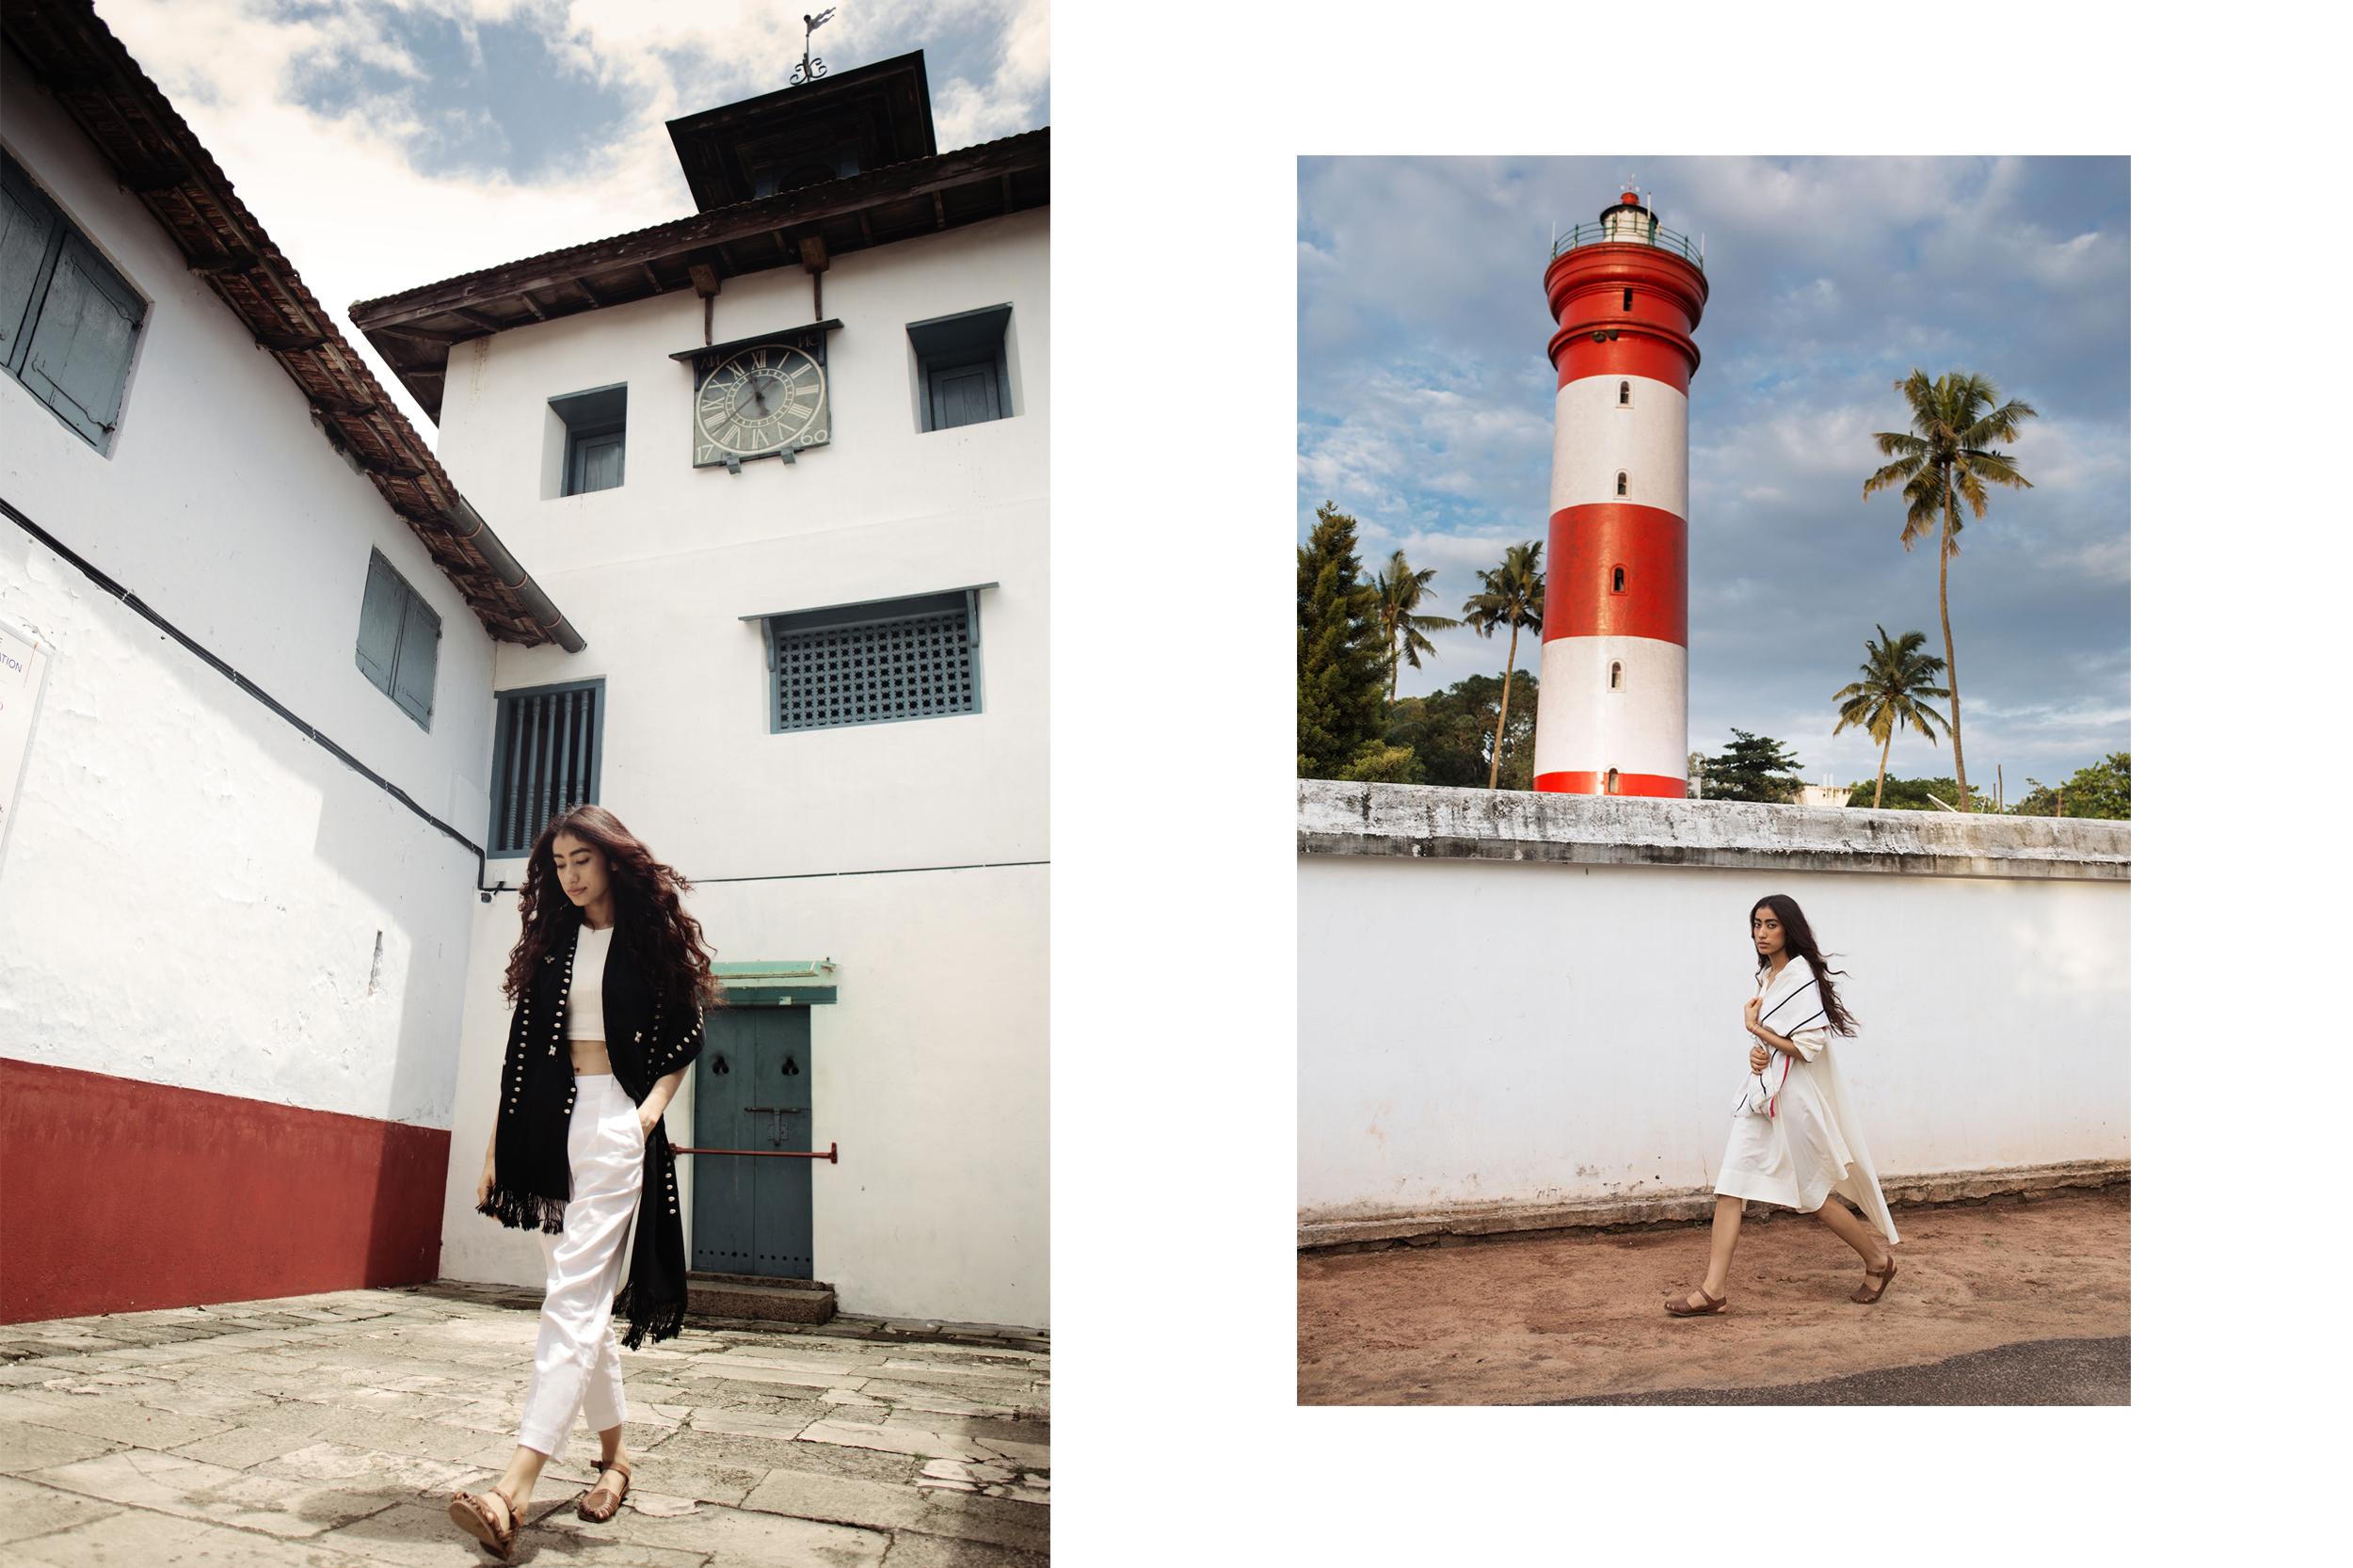 Sindhur_Photography_Fashion_Gloria tep_25.jpg